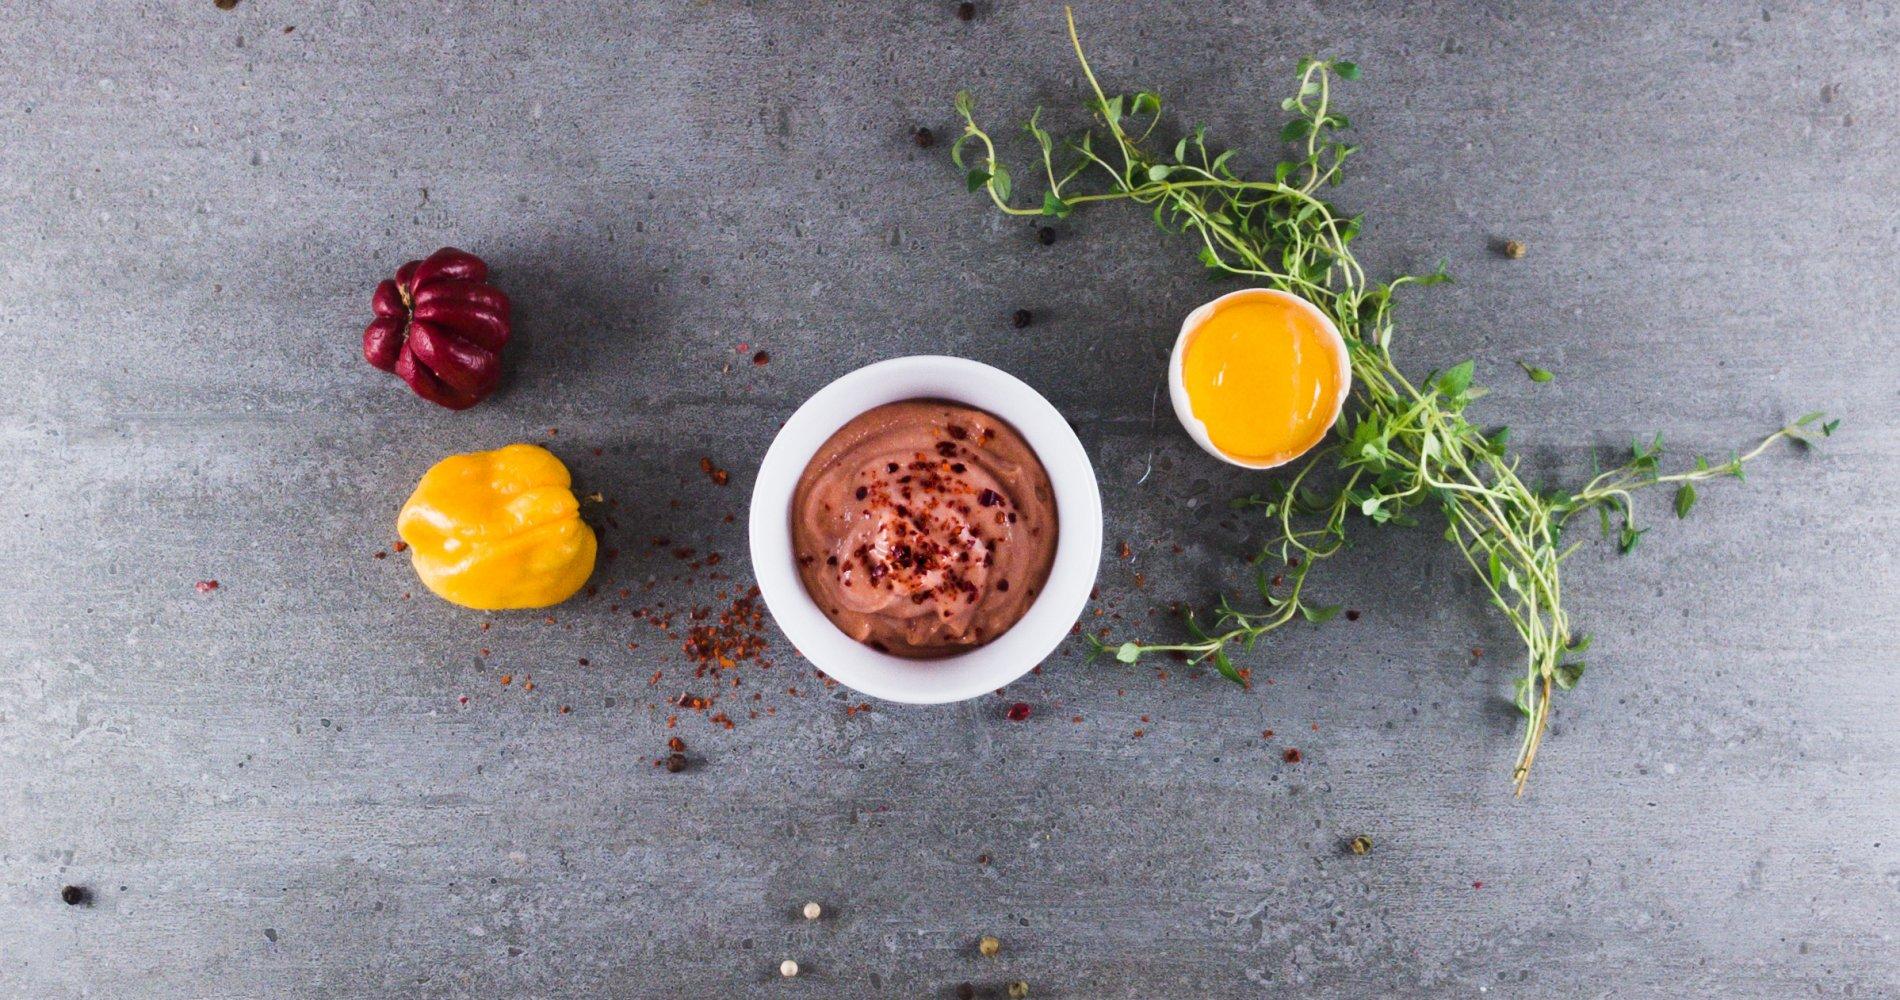 Rezept Low Carb: Scharfe Chili-Mayonnaise - LCHF-gesund.de